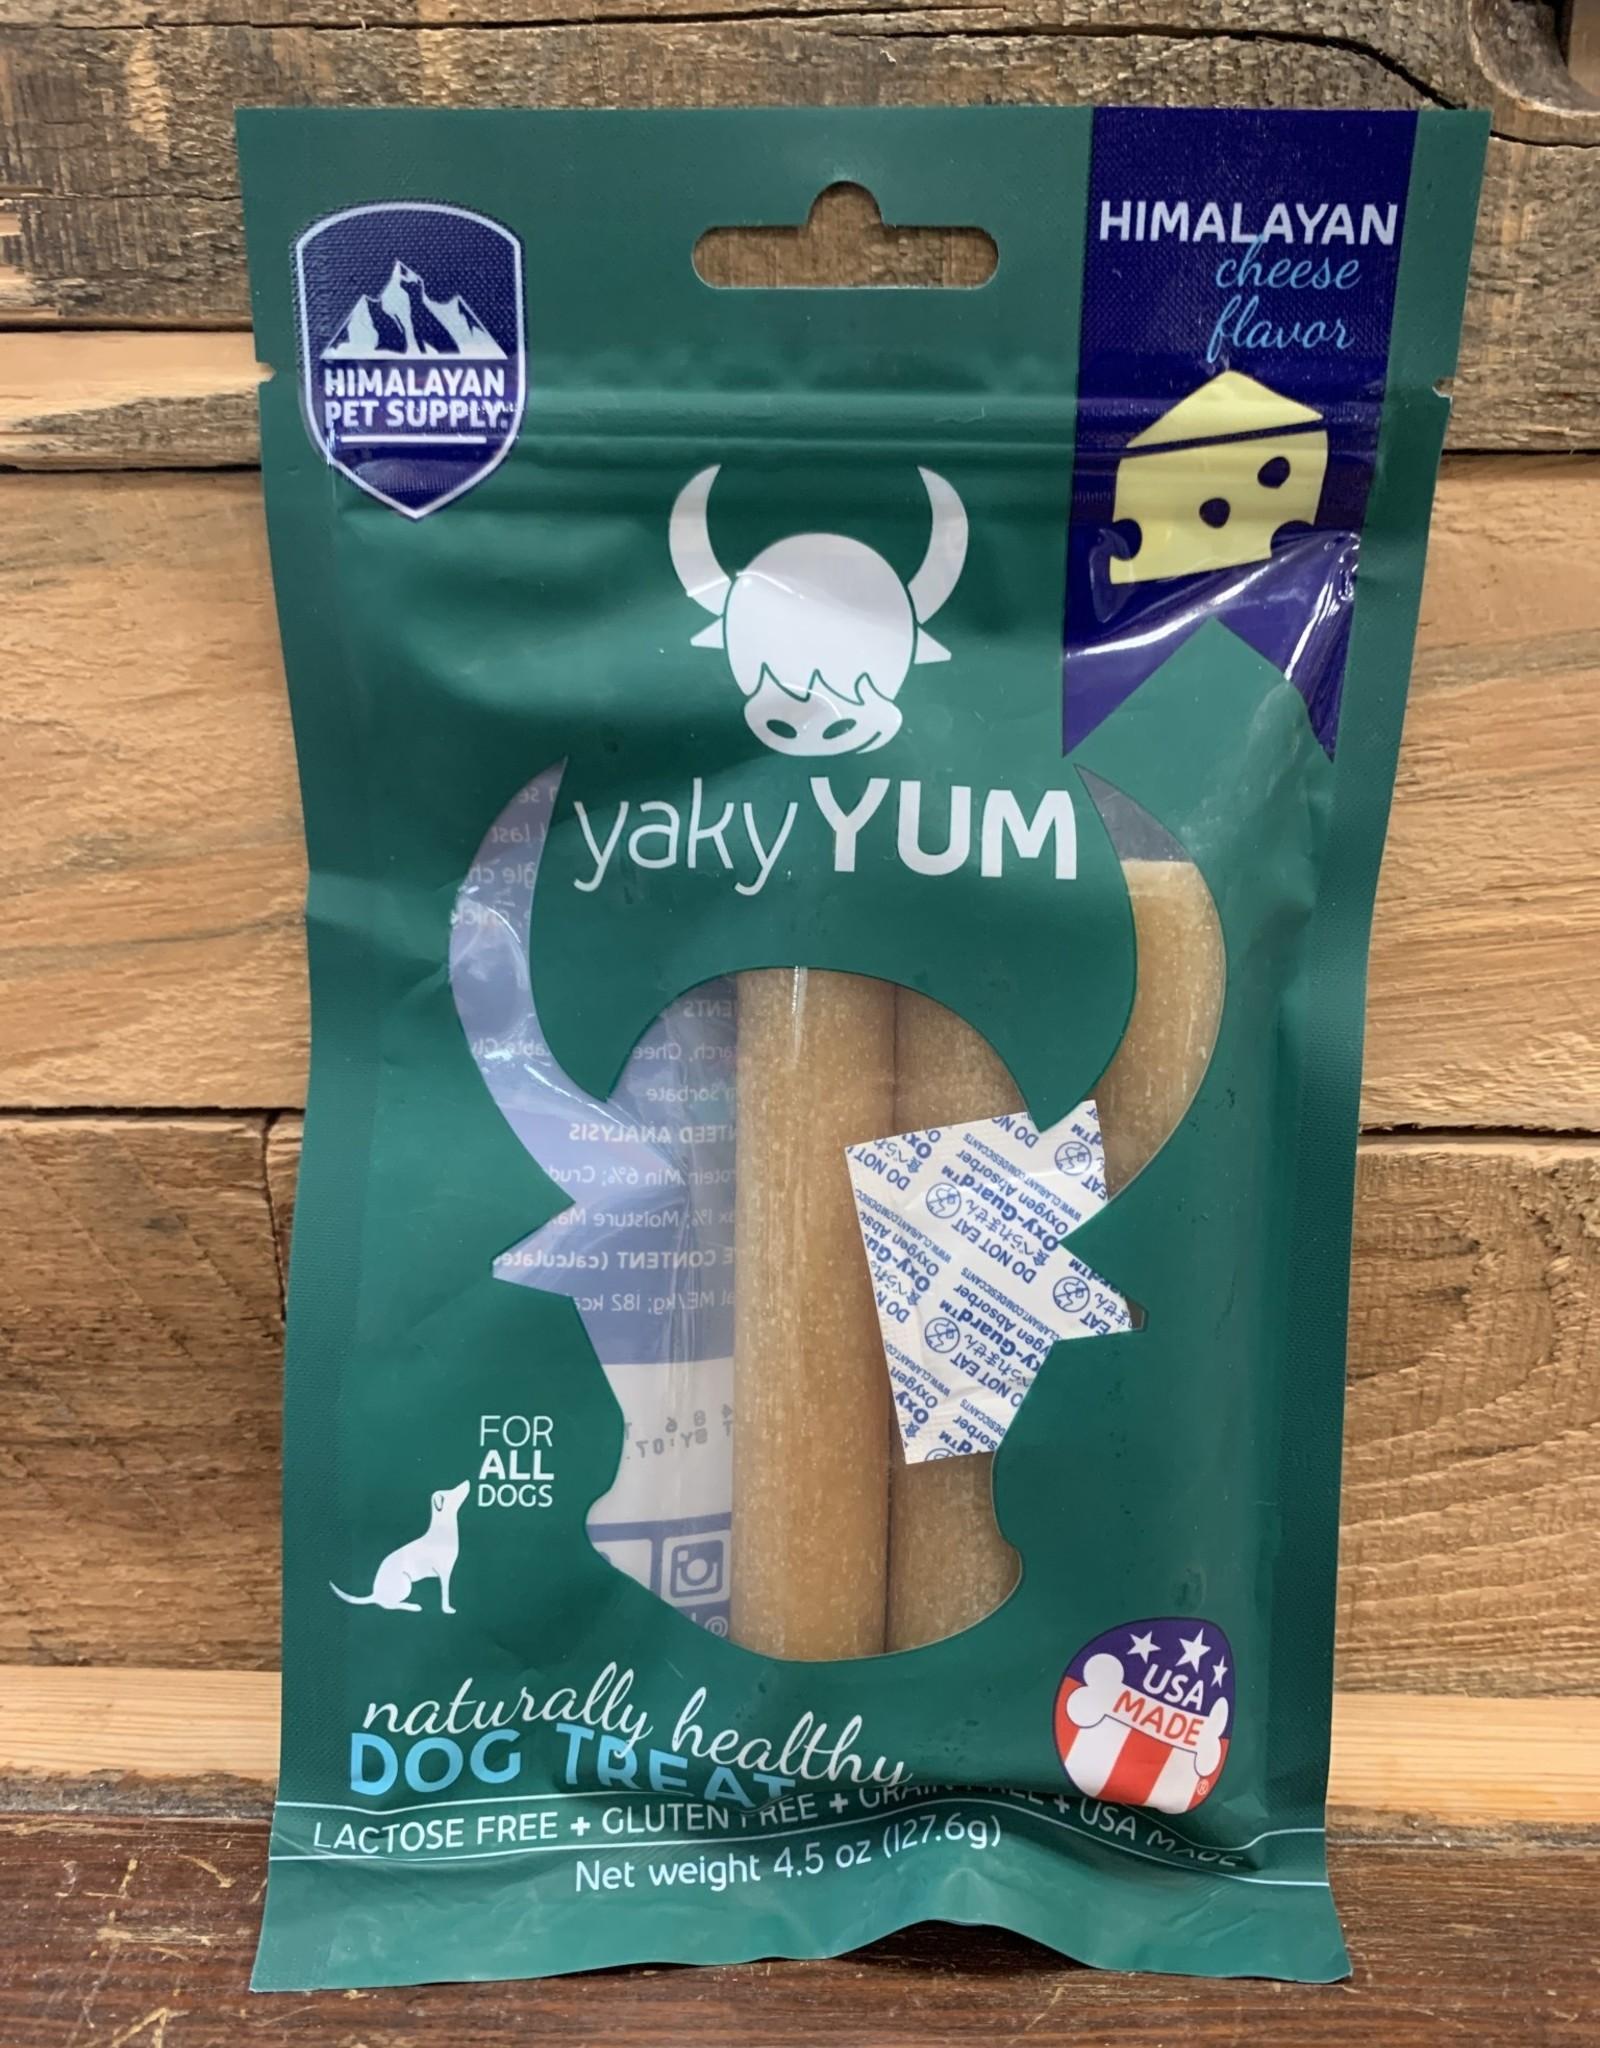 Himalayan Dog Chew Himalayan Yaky Yum - cheese